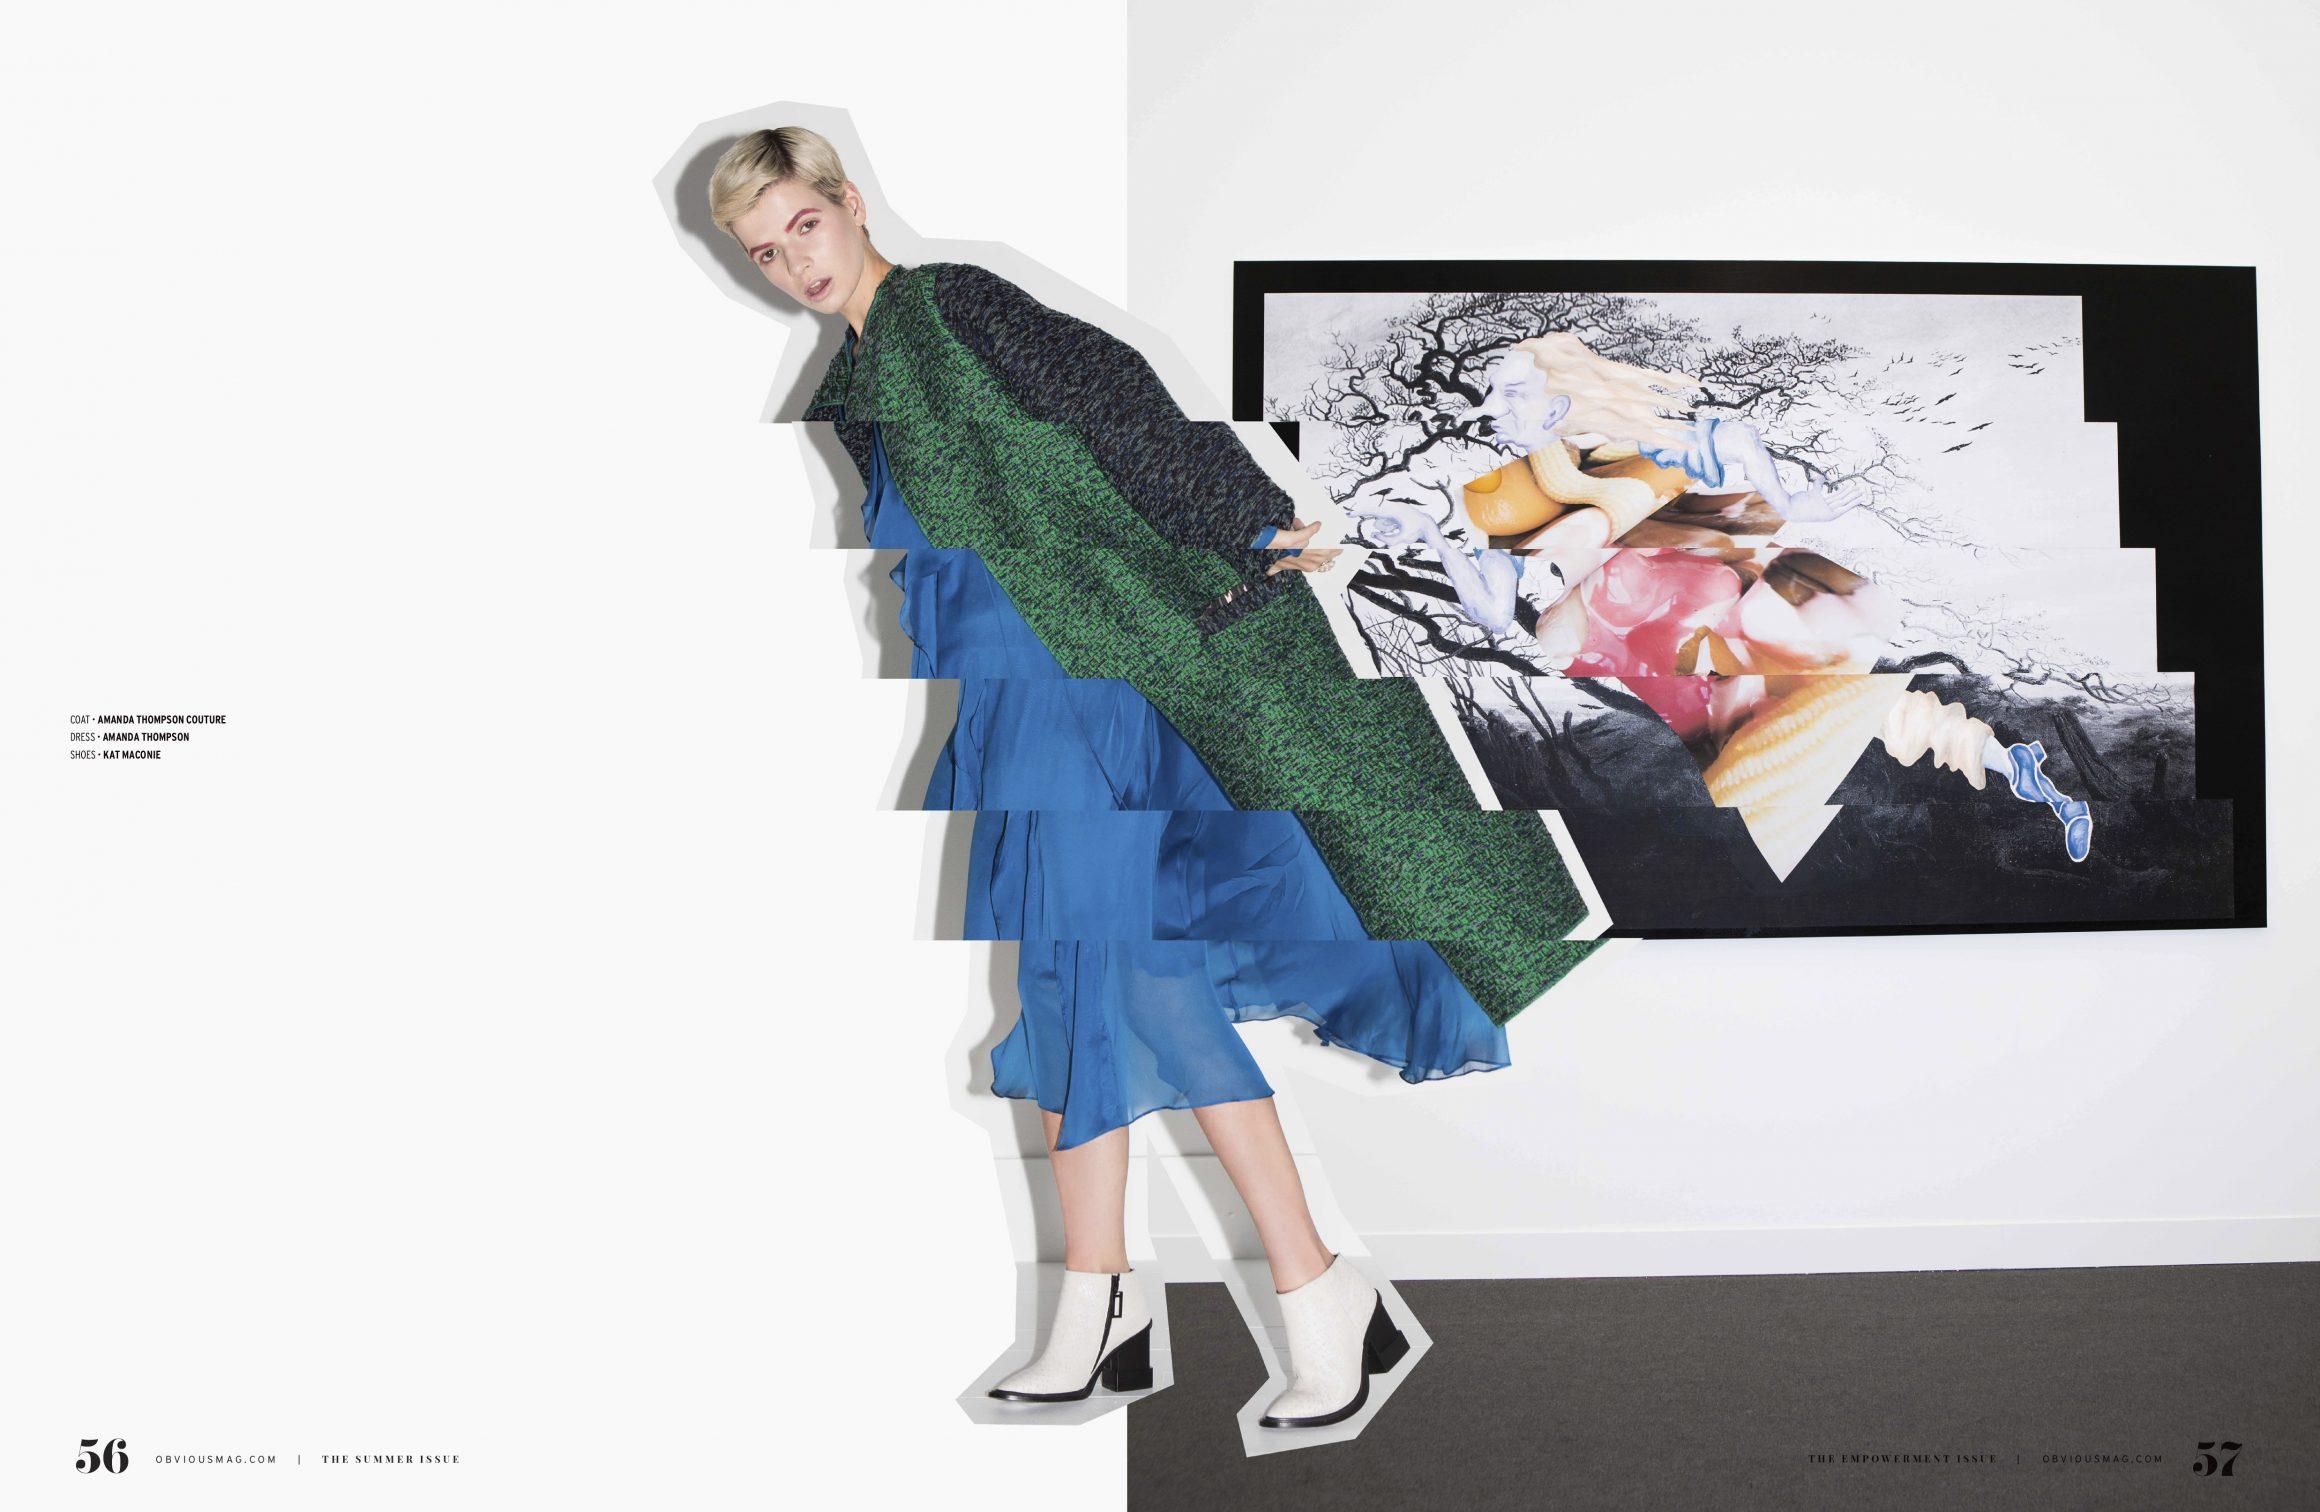 Art-Of-Fashion-2-2320x1512.jpg